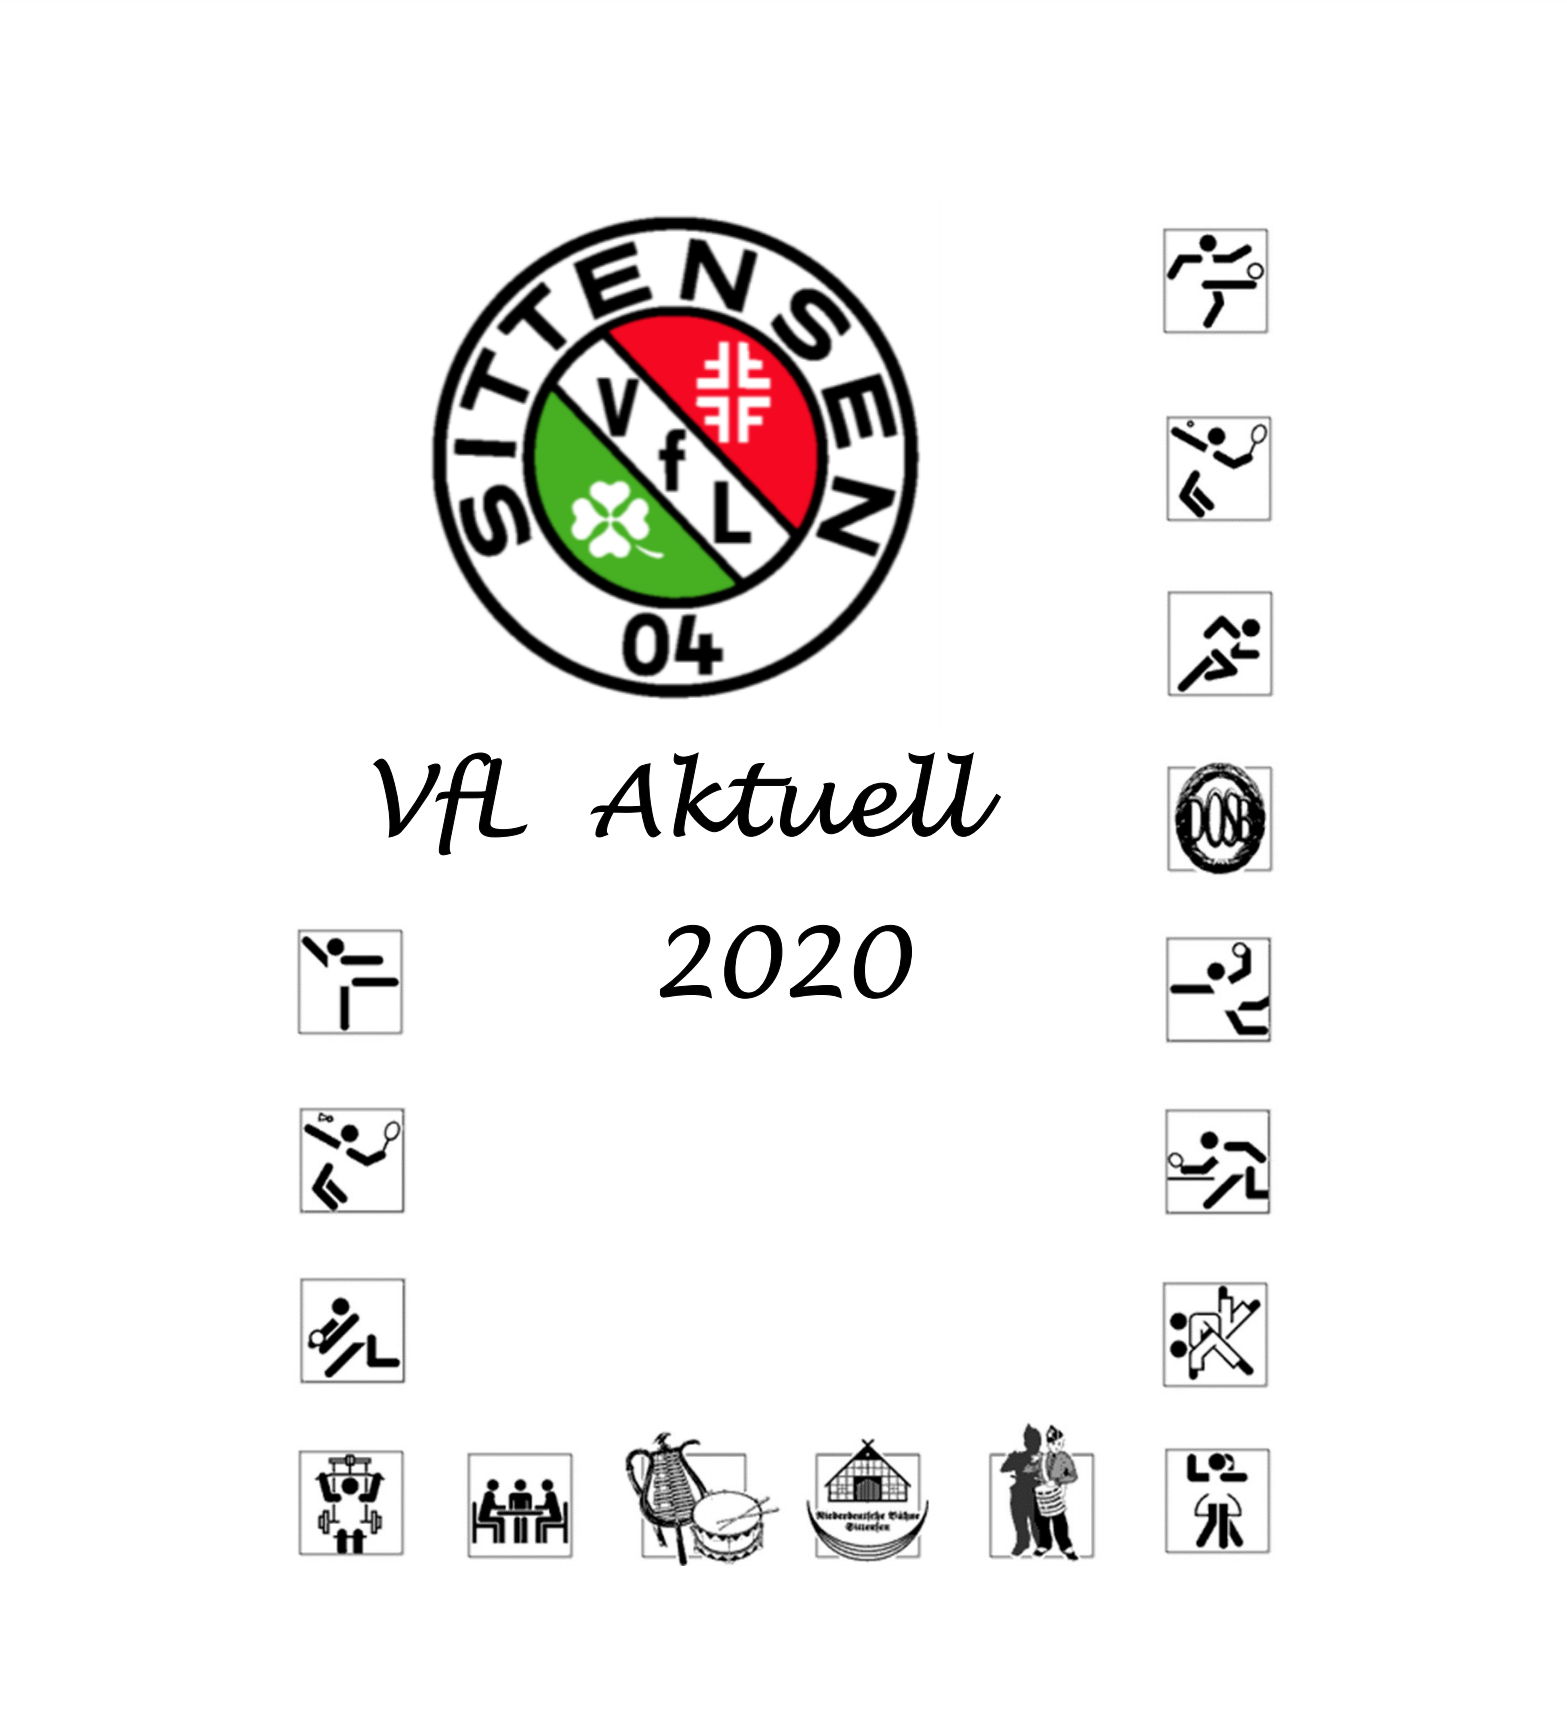 VfL Aktuell 2020